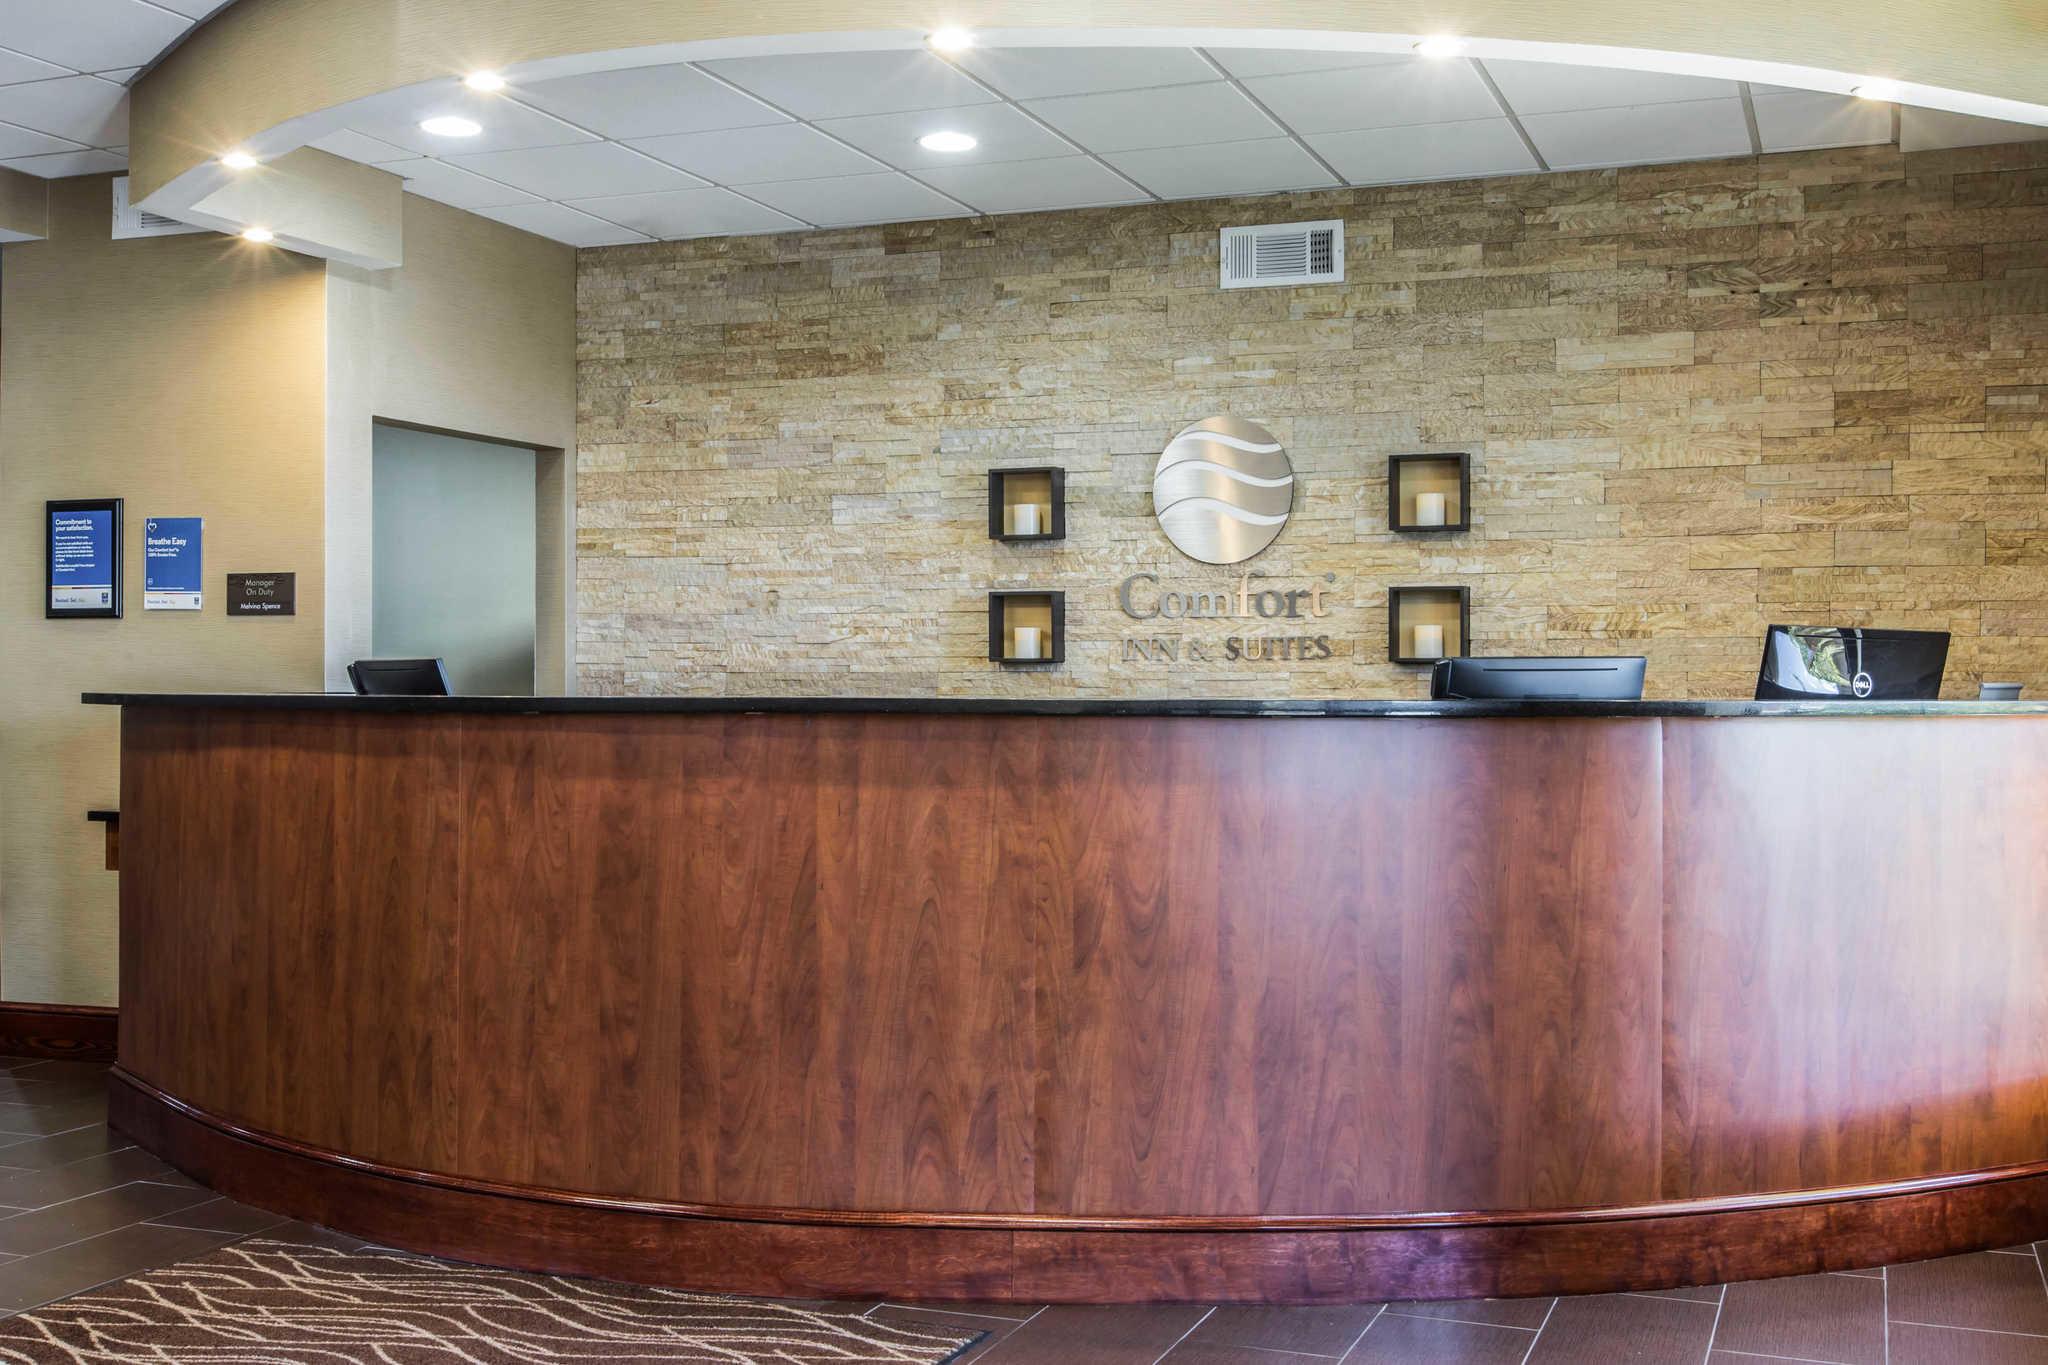 Comfort Inn & Suites West image 5